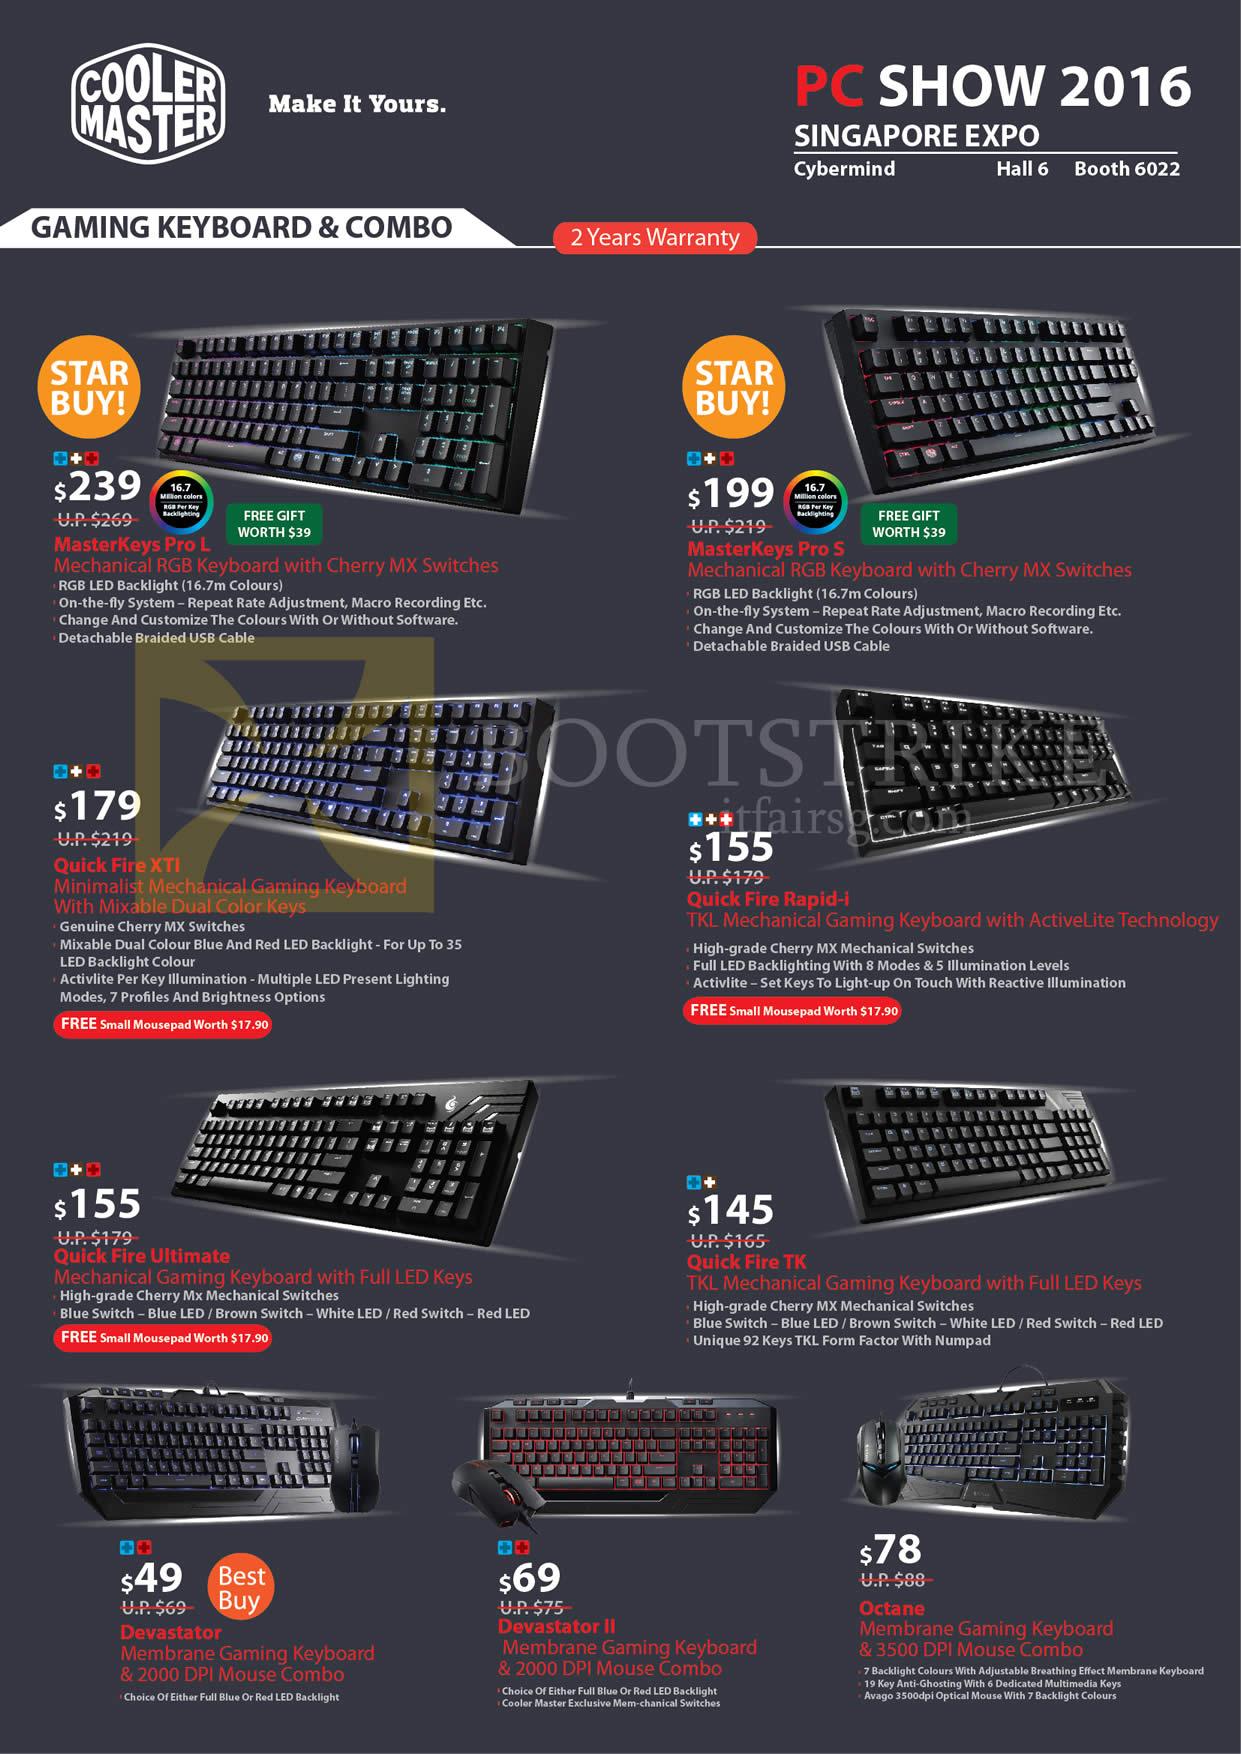 PC SHOW 2016 price list image brochure of Cybermind Cooler Master Mechanical Keyboards, MasterKeys, Quick Fire, Devastator, Octane